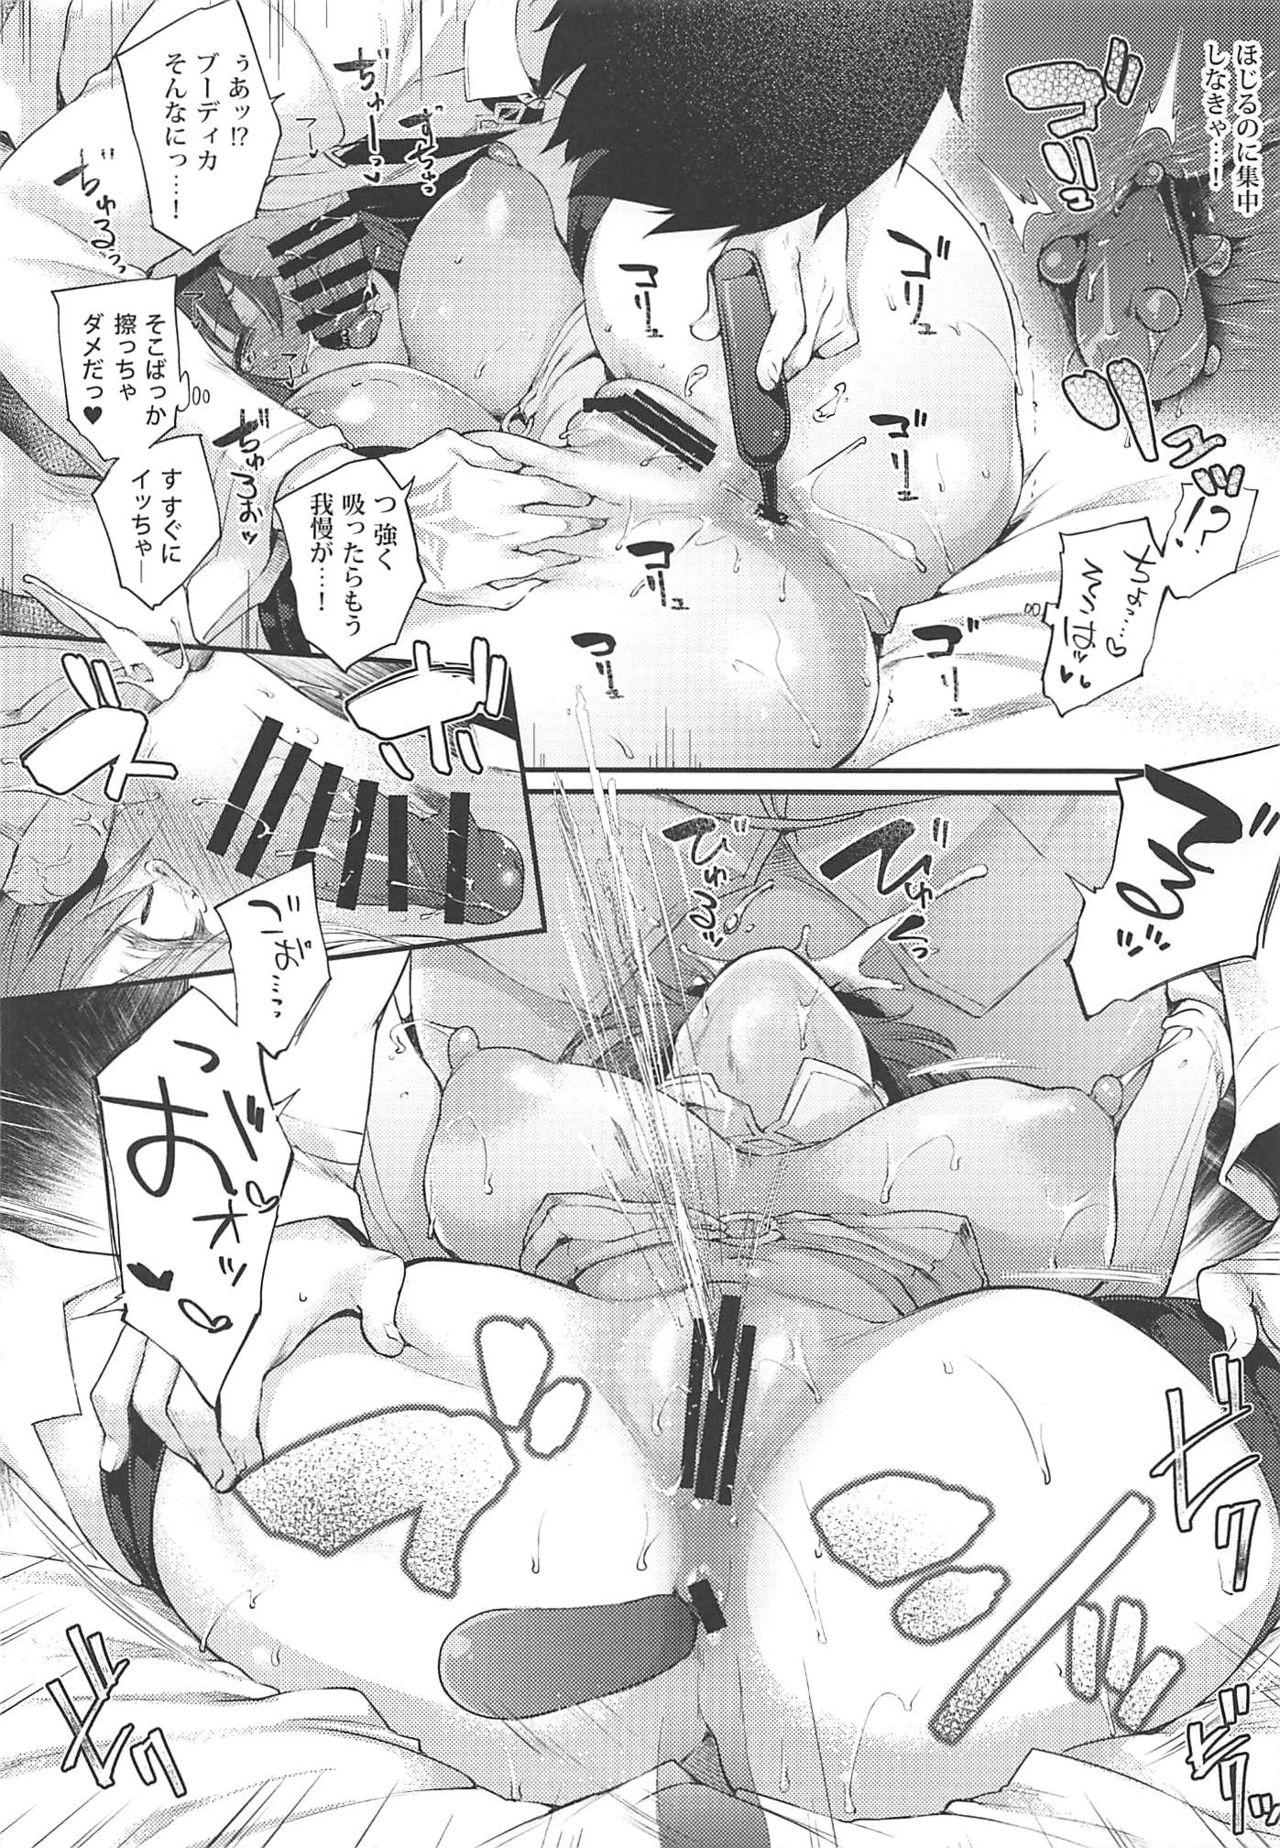 [Mata Ashita. (Oohira Sunset)] Boudica-san to Gom. -Anal Hen- (Fate/Grand Order) [2019-09-22] 8